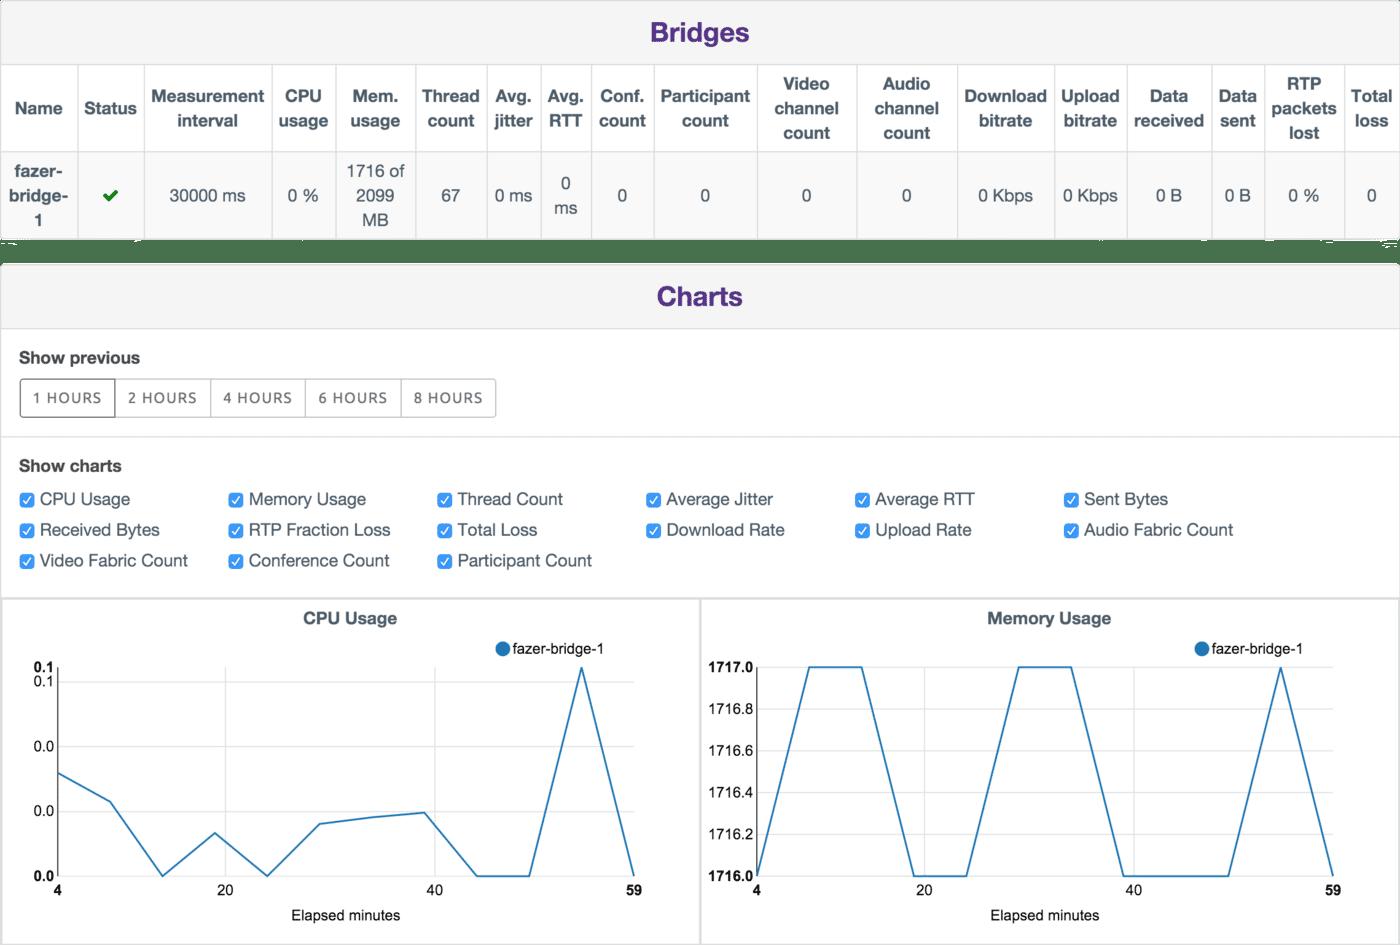 The Bridges page displays server and WebRTC specific metrics